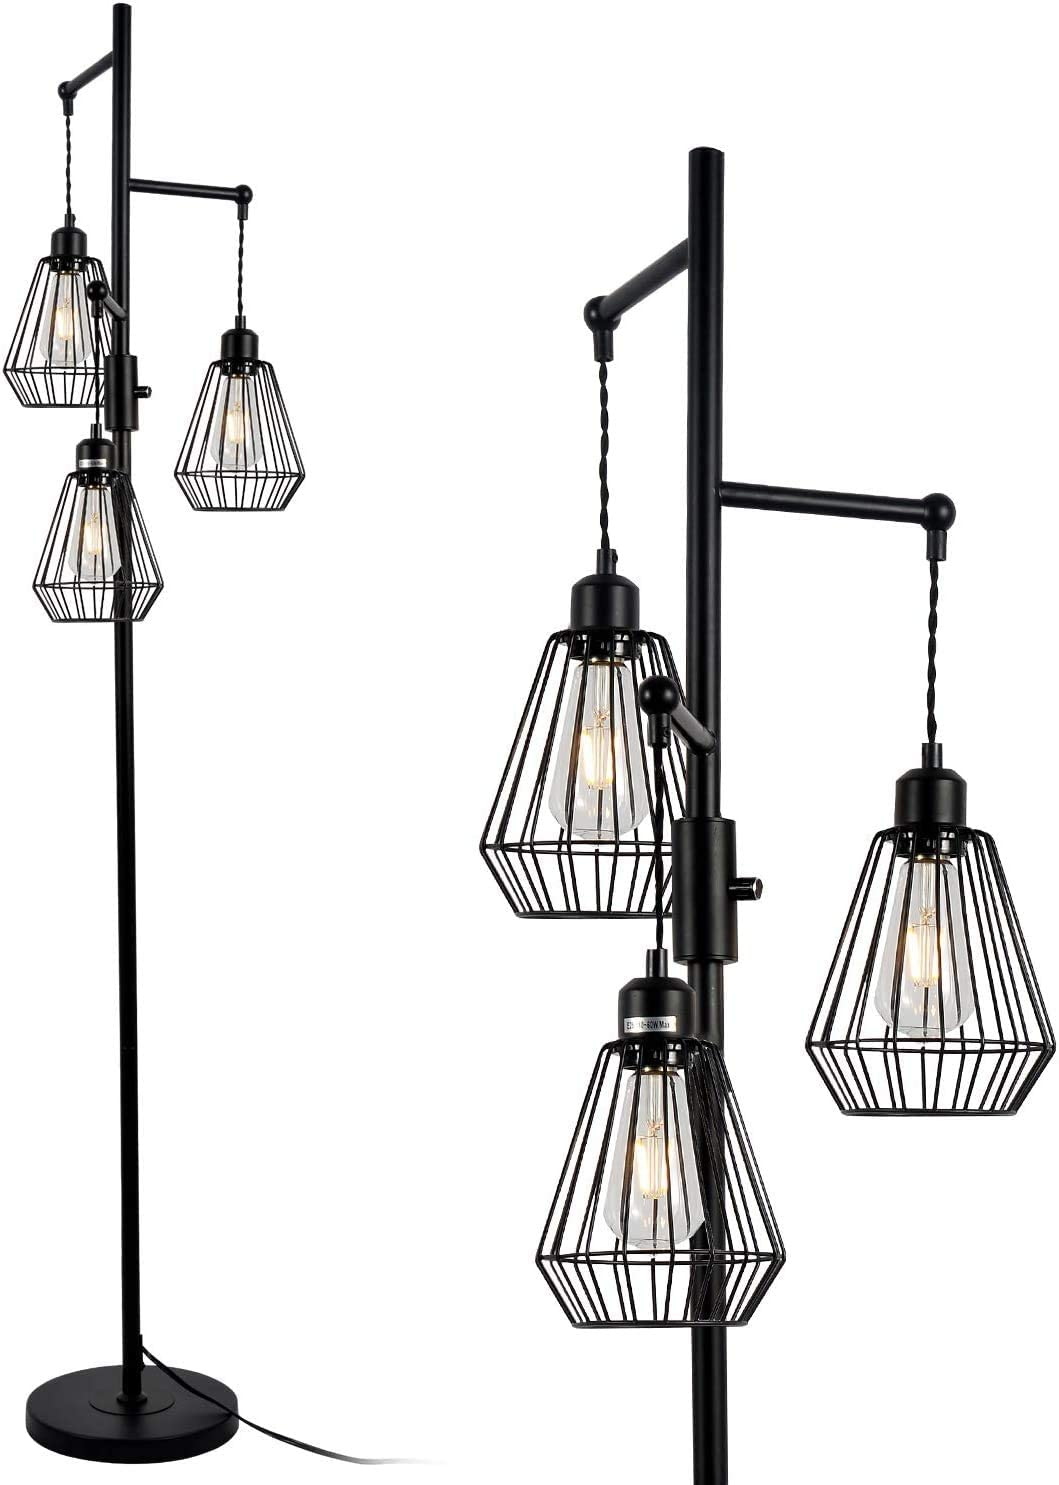 Stepeak Dimmable Cage Floor Lamp